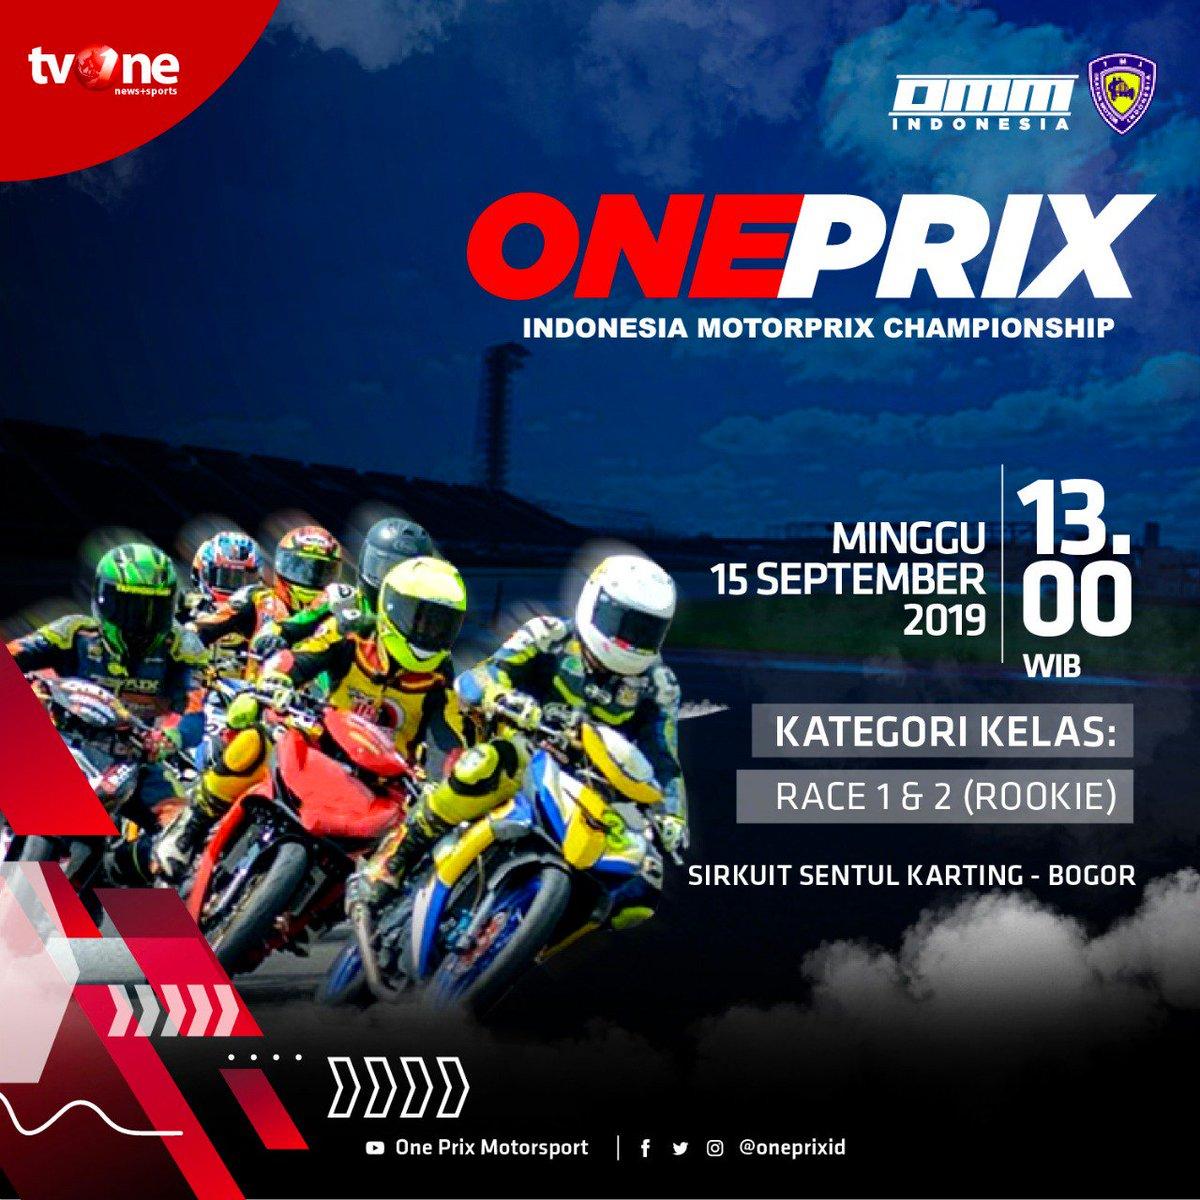 Jangan lewatkan race seru putaran 3 @oneprixid Indonesia Motorprix Championship kelas Rookie. Minggu, 15 September 2019 jam 13.00 WIB hanya di tvOne & streaming di tvOne connect, android http://bit.ly/2EMxVdm & ios https://apple.co/2CPK6U3 #Oneprix #OneprixSentul